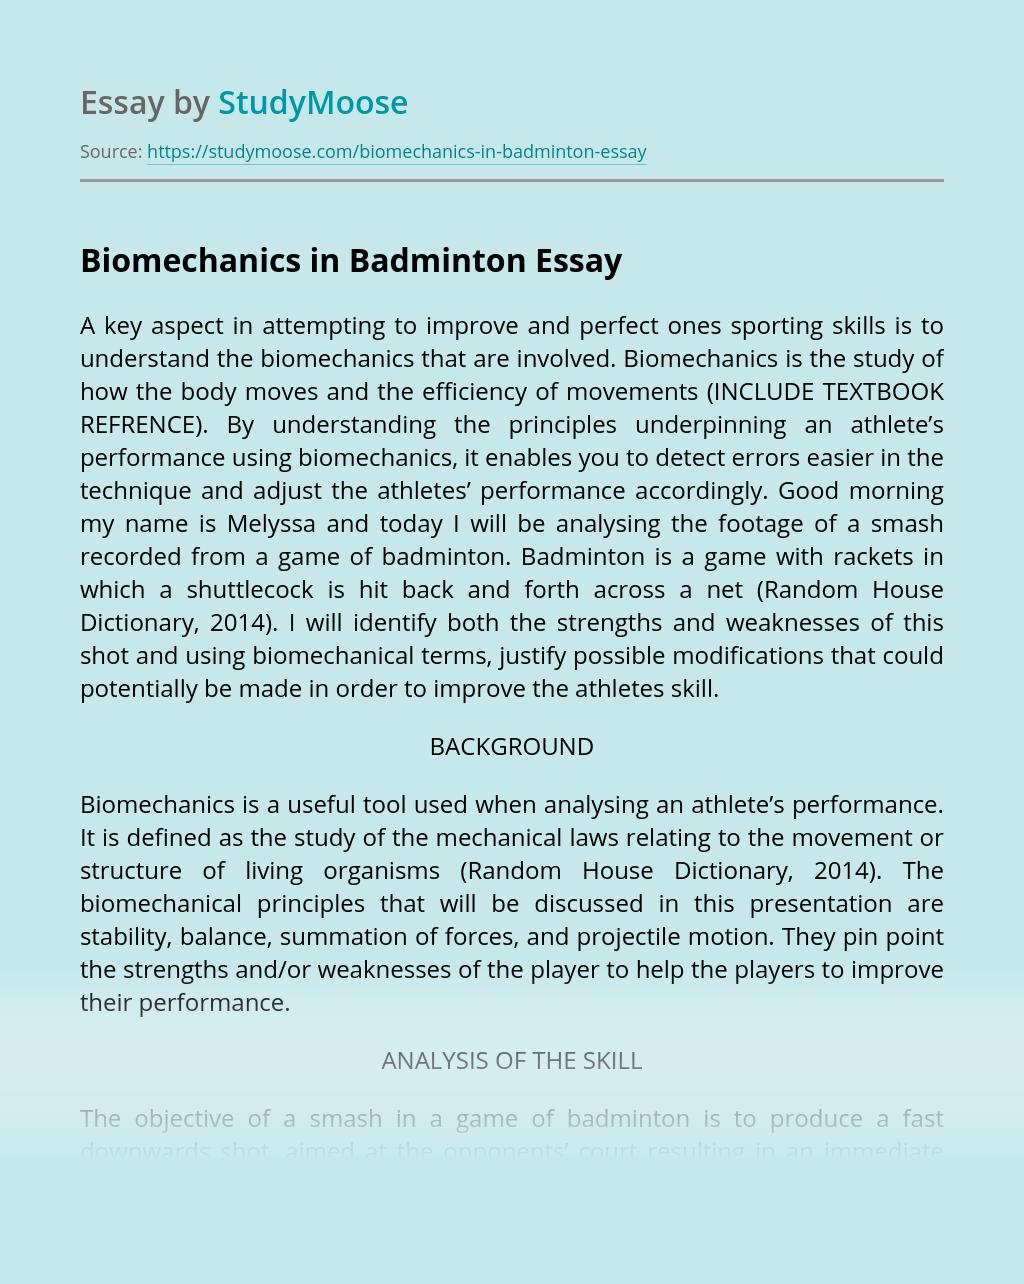 Biomechanics in Badminton